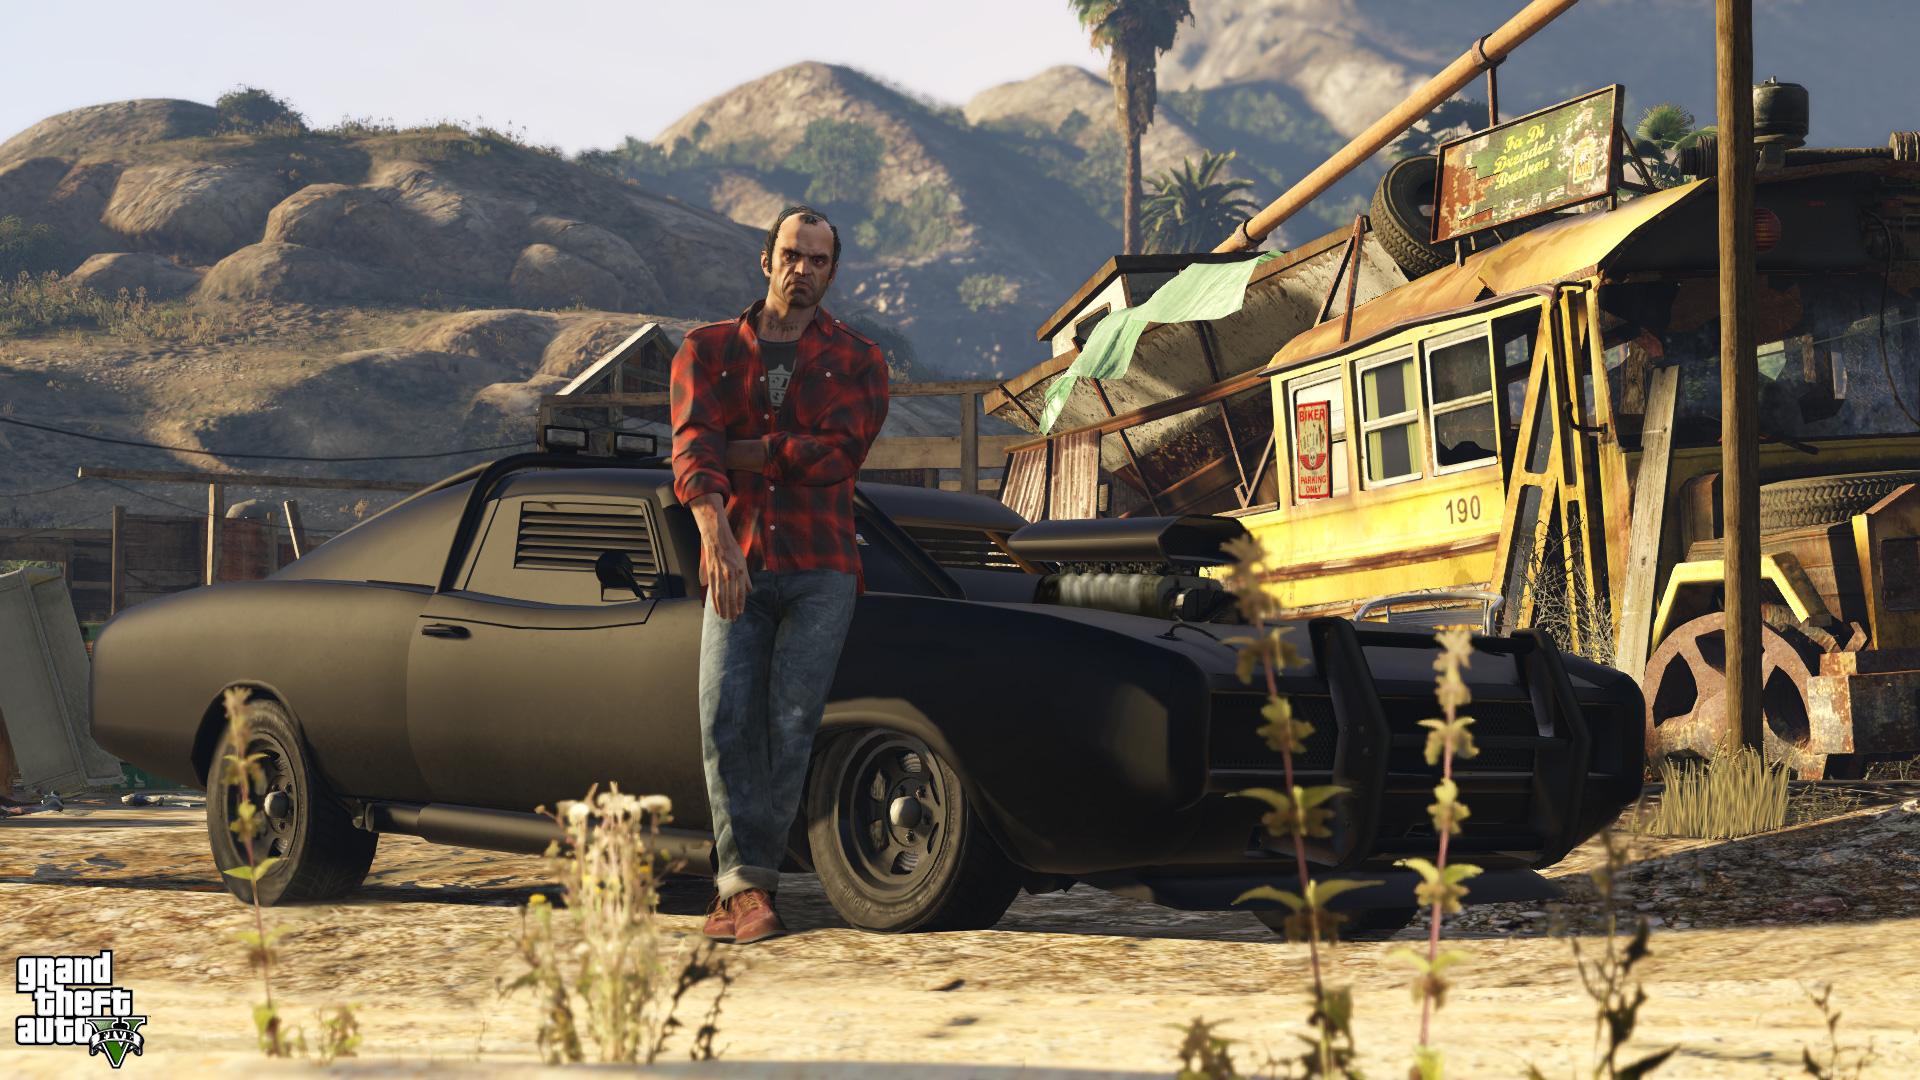 Grand Theft Auto V Hd Wallpaper Background Image 1920x1080